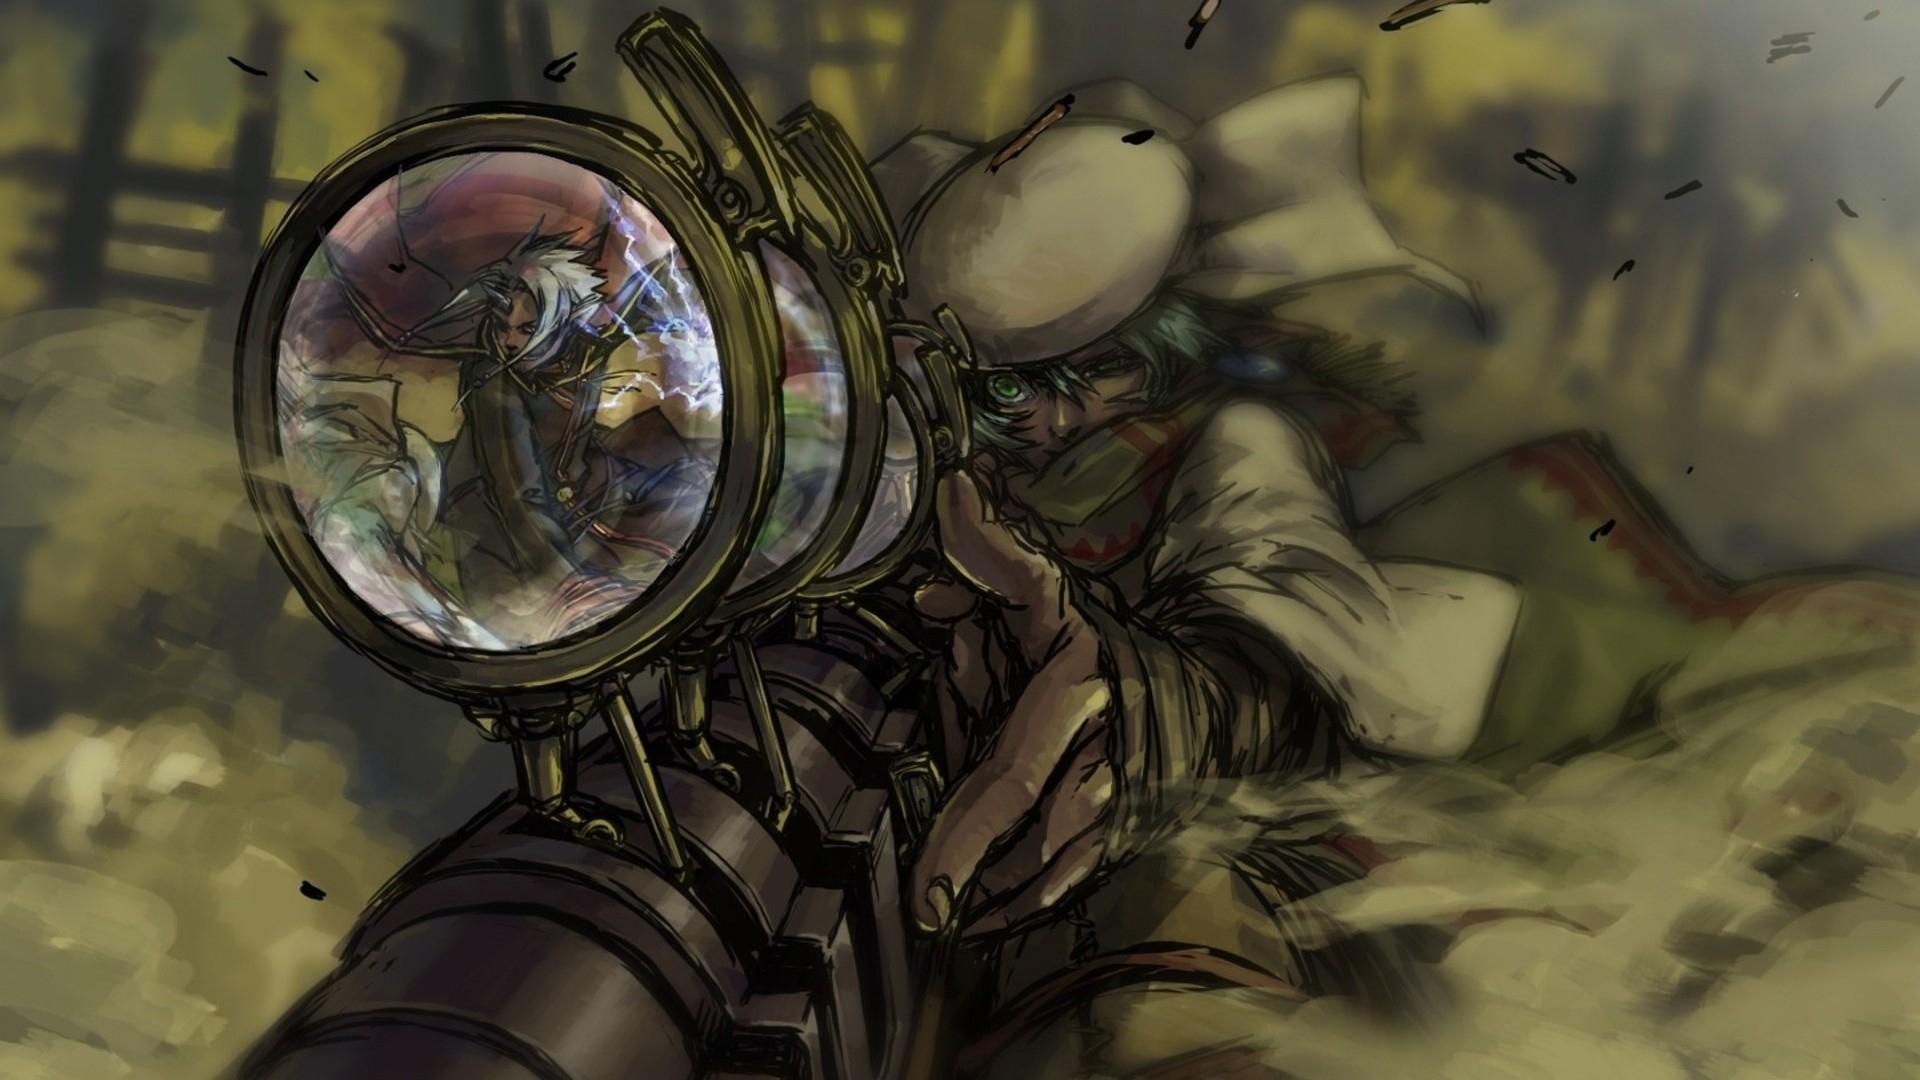 steampunk mechanical sniper weapons guns anime wallpaper background 1920x1080